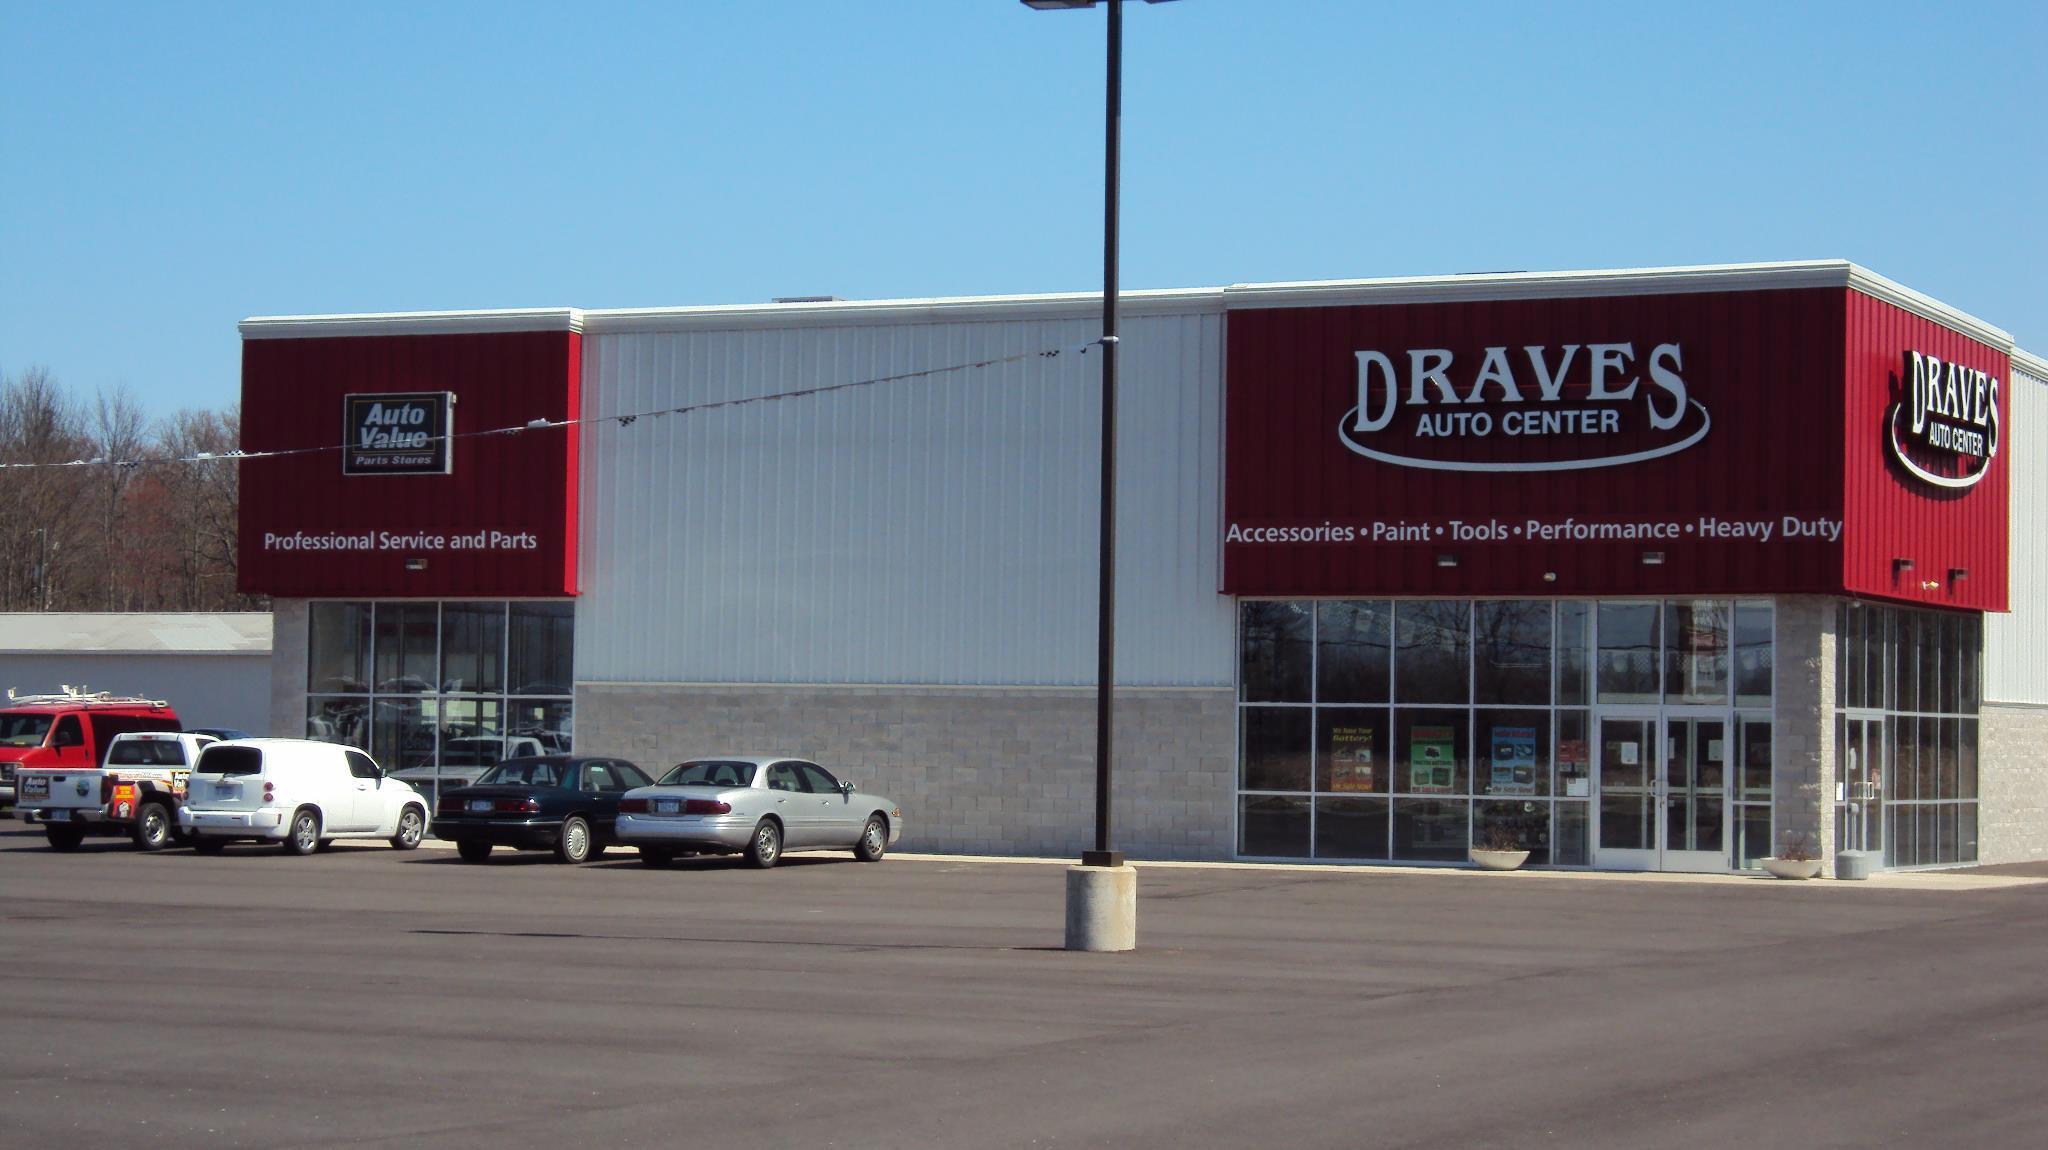 Draves Auto Center image 1